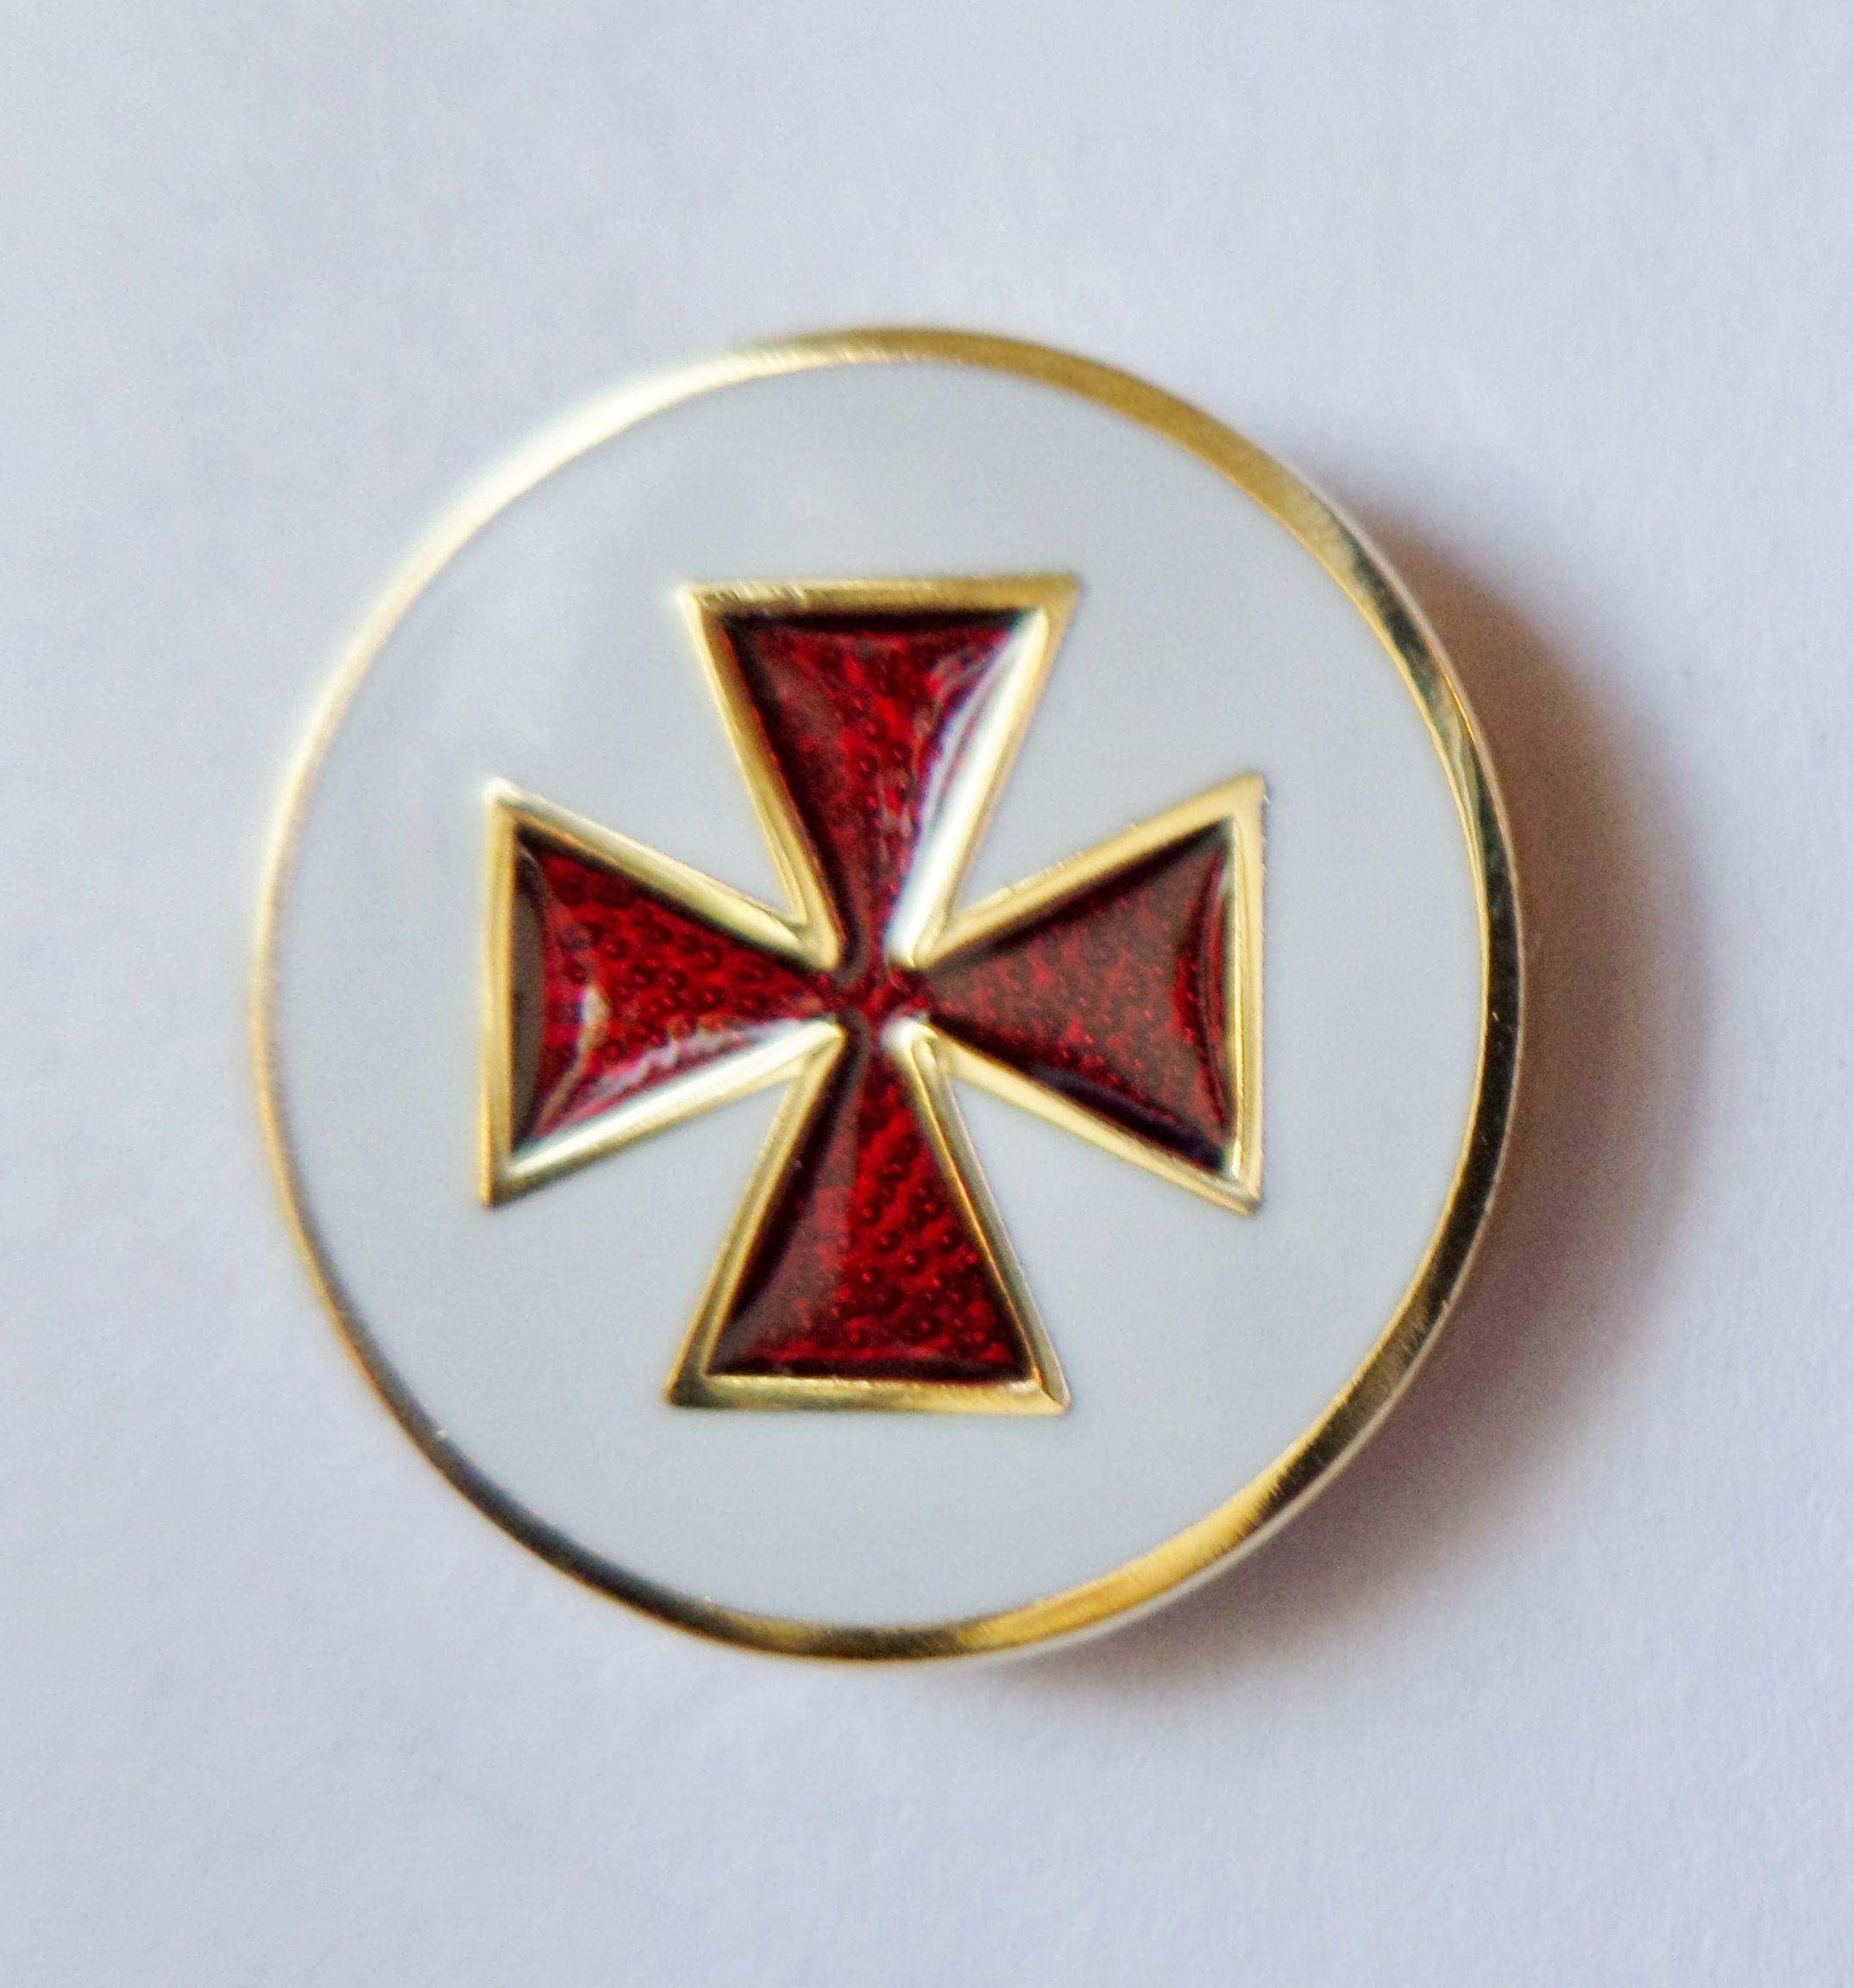 Knights Templar Cross Patt̩e Round Masonic Pin Badge РK032